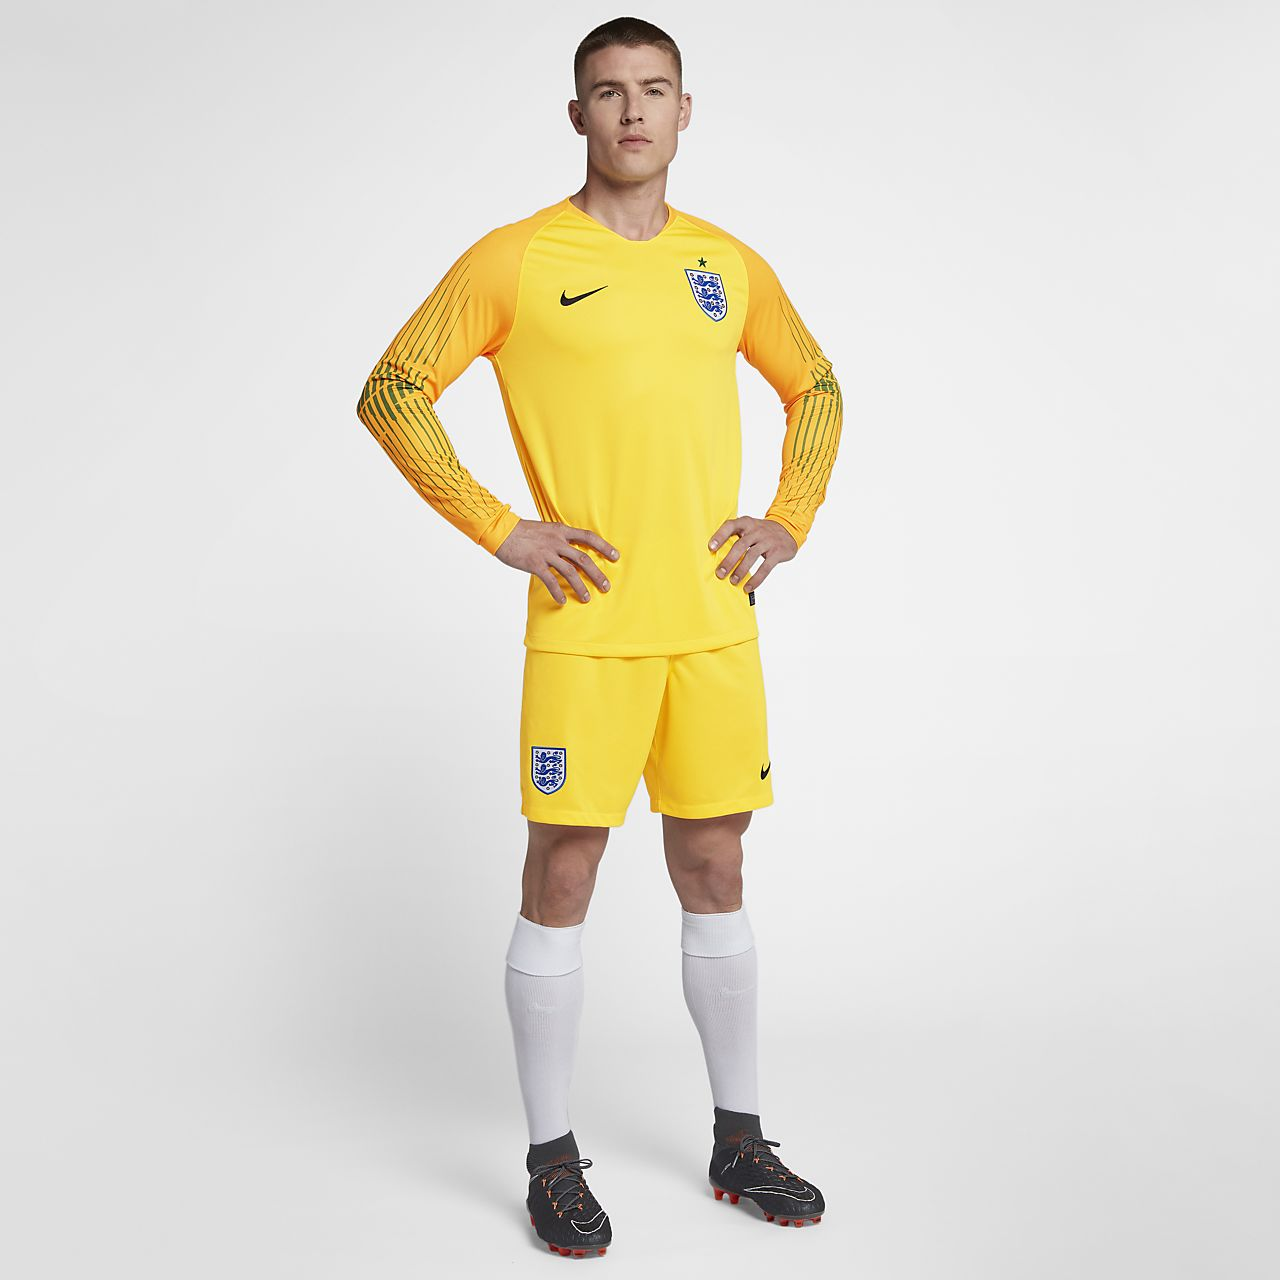 e2b420ec295 2018 England Stadium Goalkeeper Men s Football Shorts. Nike.com GB